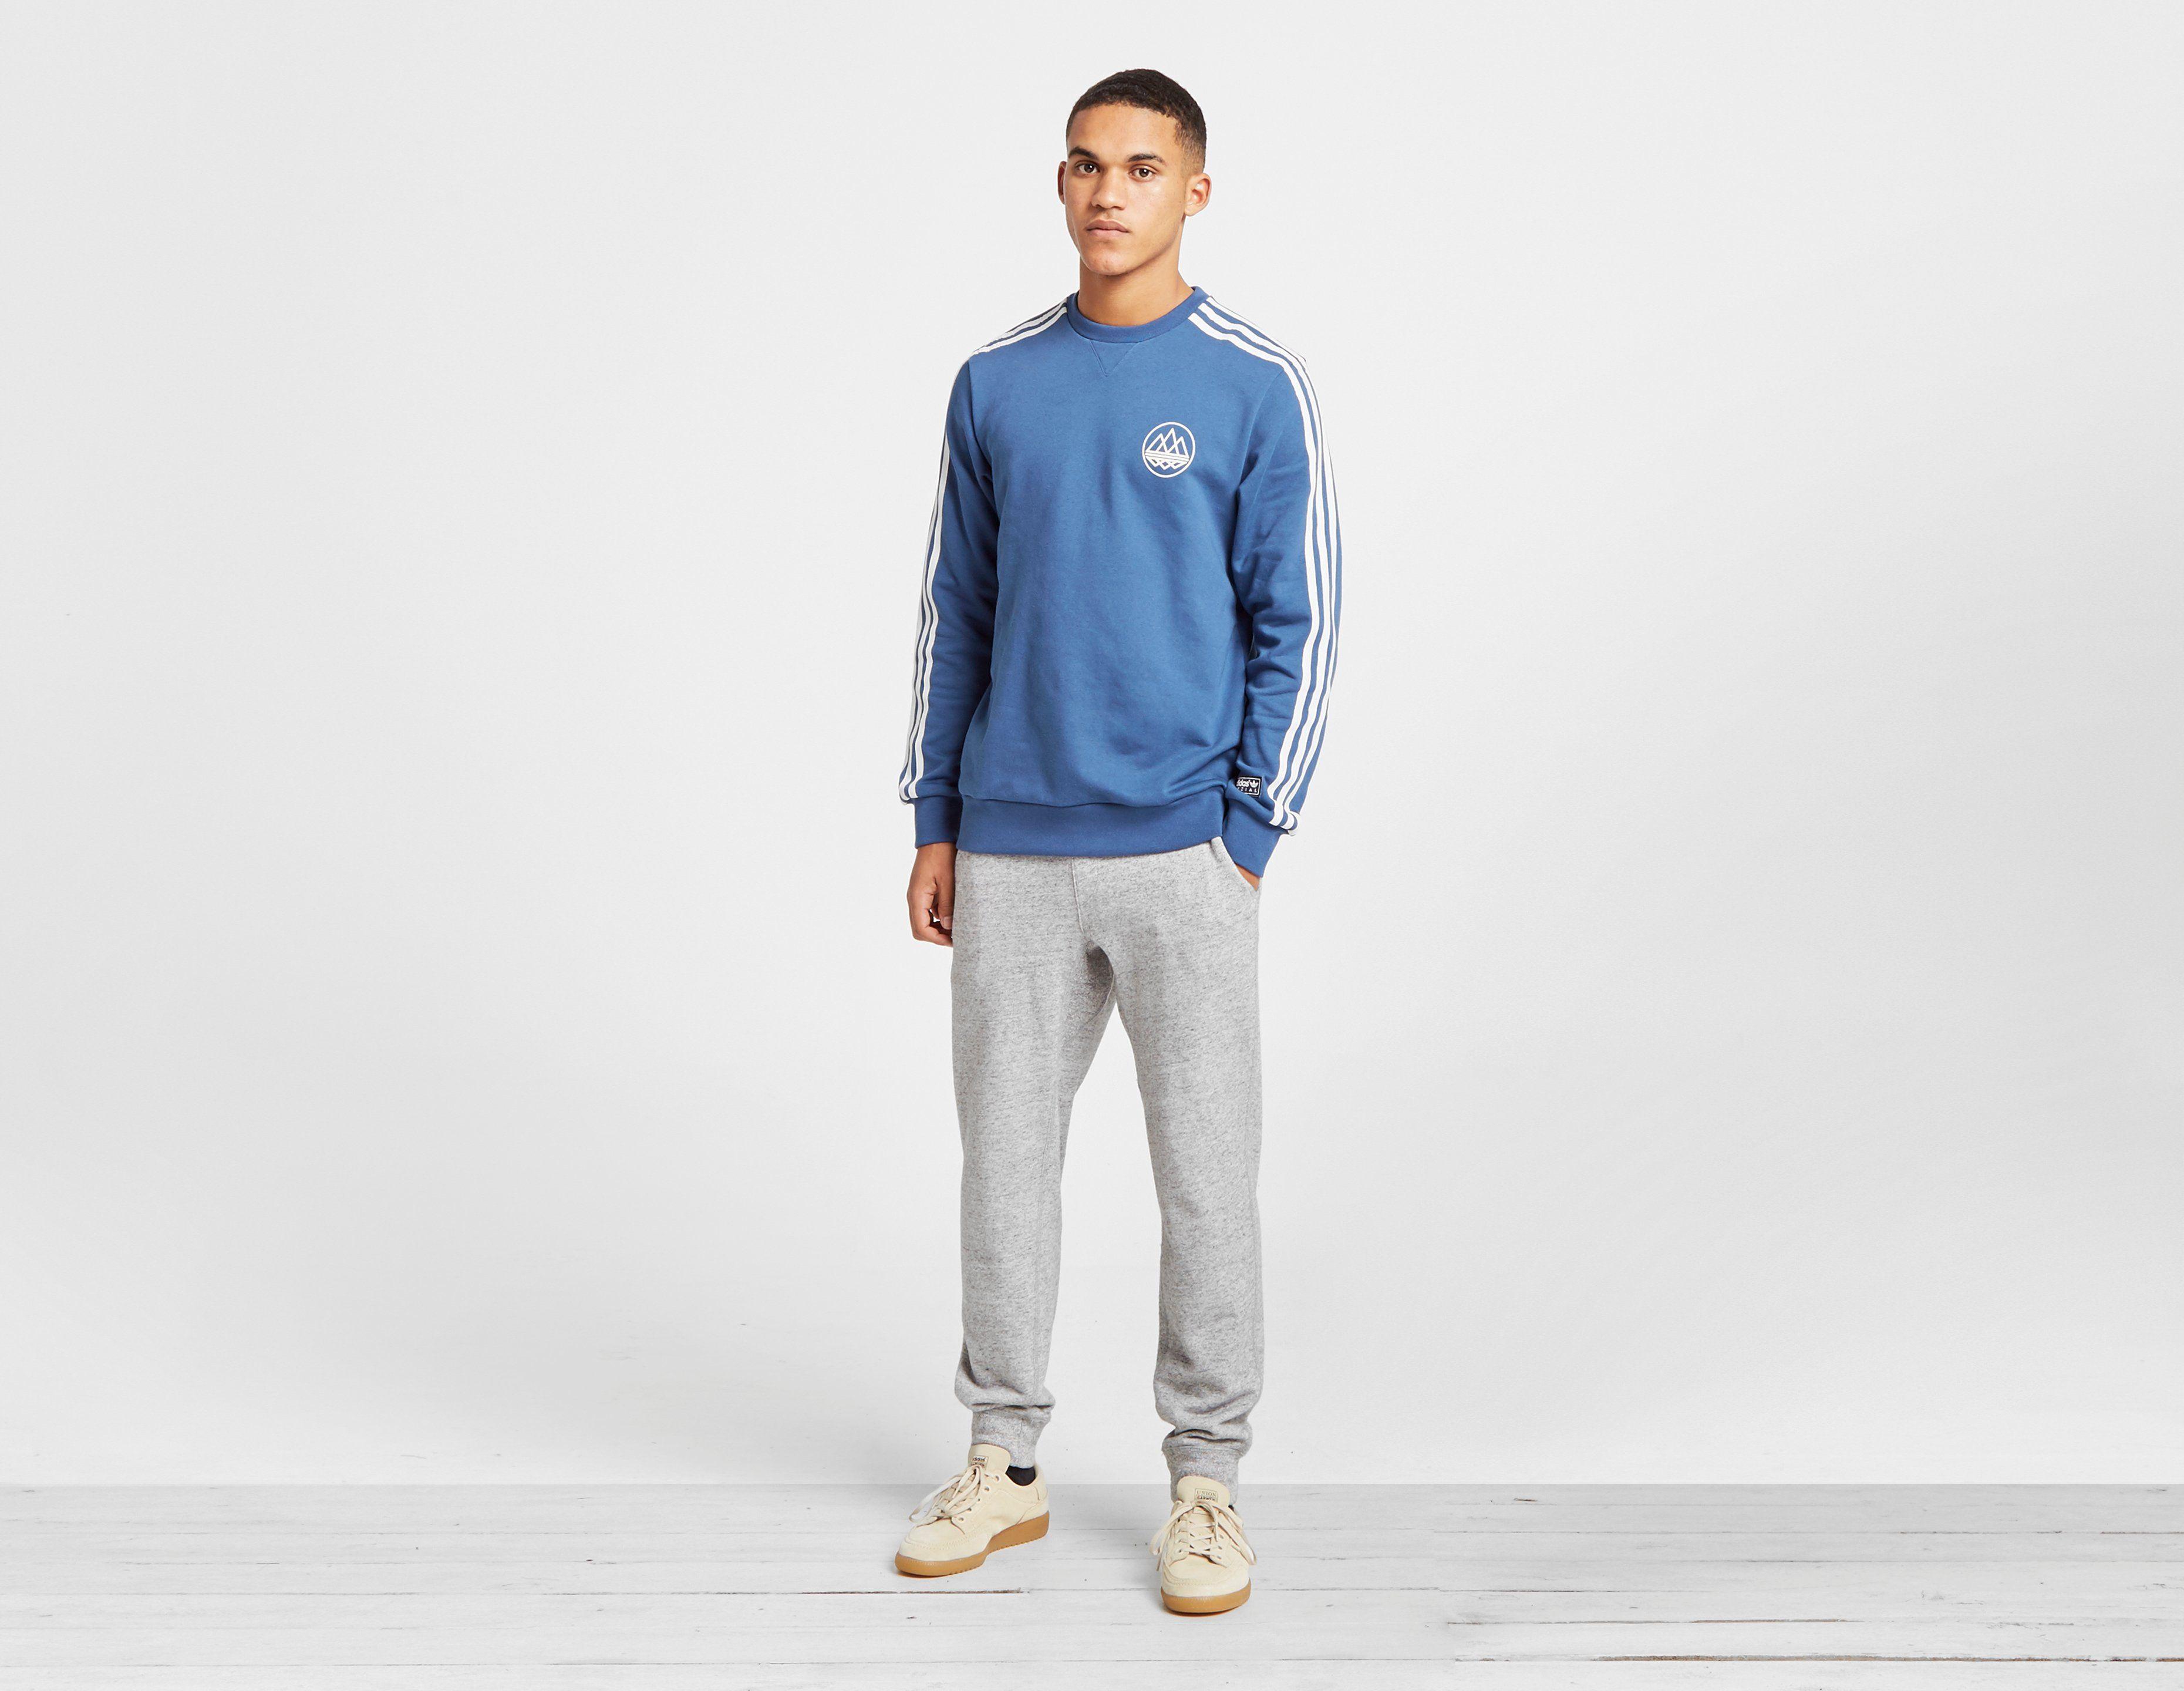 adidas SPEZIAL x Union Crewneck Sweatshirt